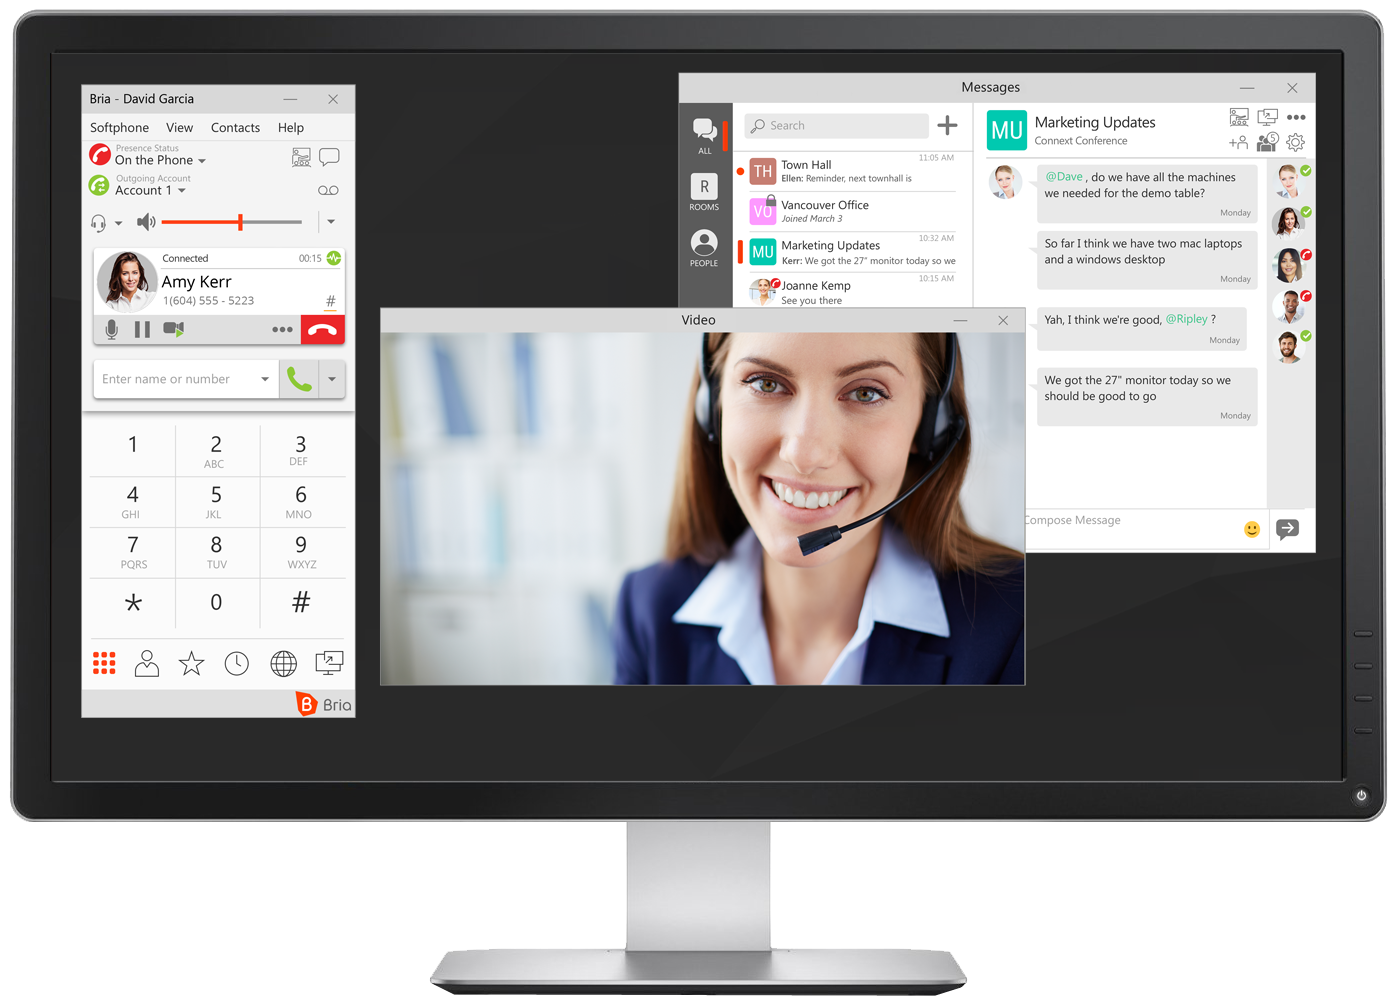 Bria PC - In Call GROUP Desktop